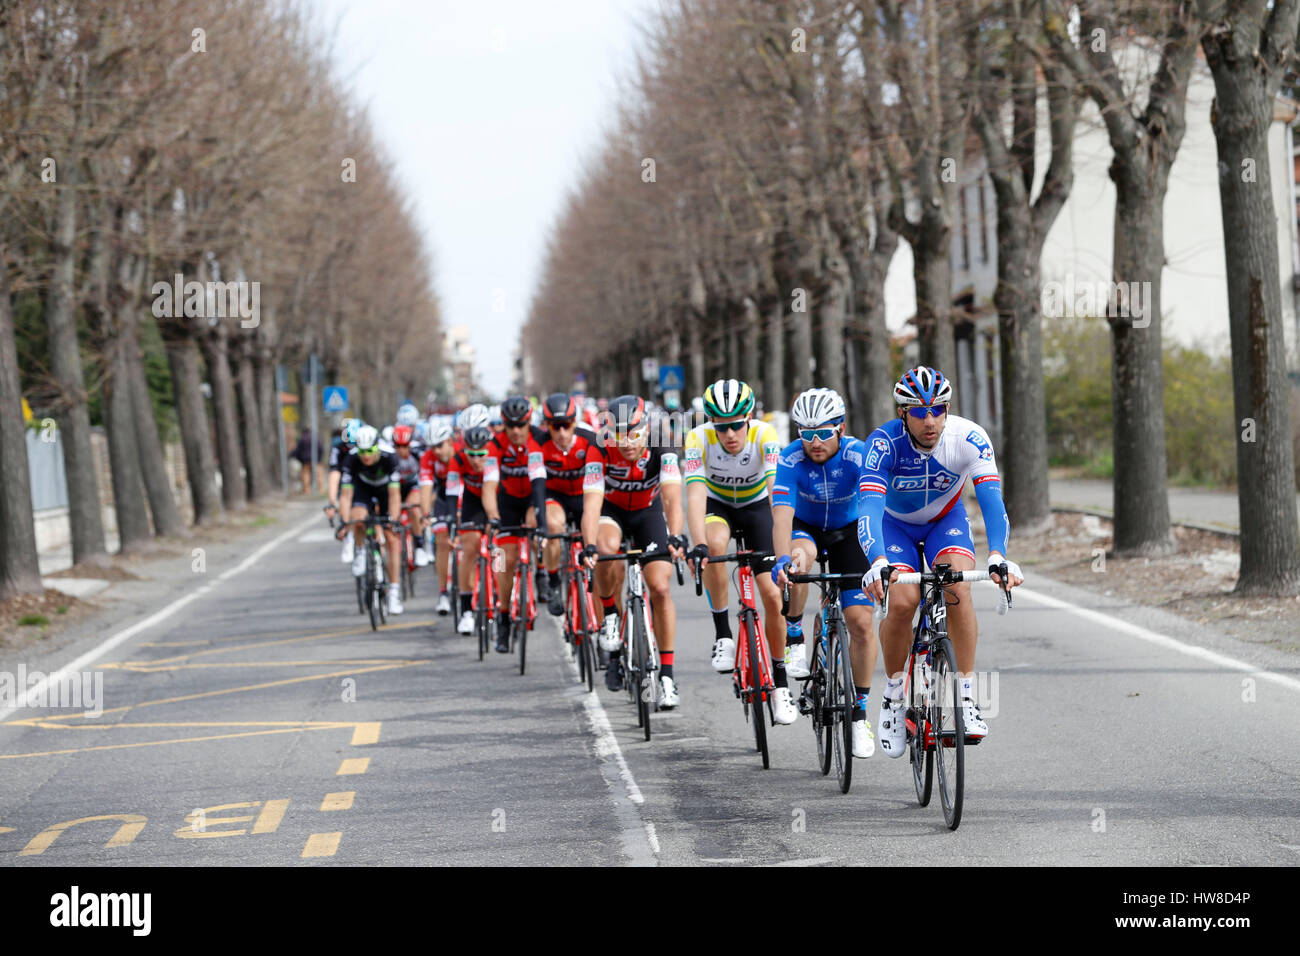 18 marzo 2017 108th Milano - Sanremo cofano William (FRA) FDJ Foto: Cronos/Yuzuru Sunada Foto Stock